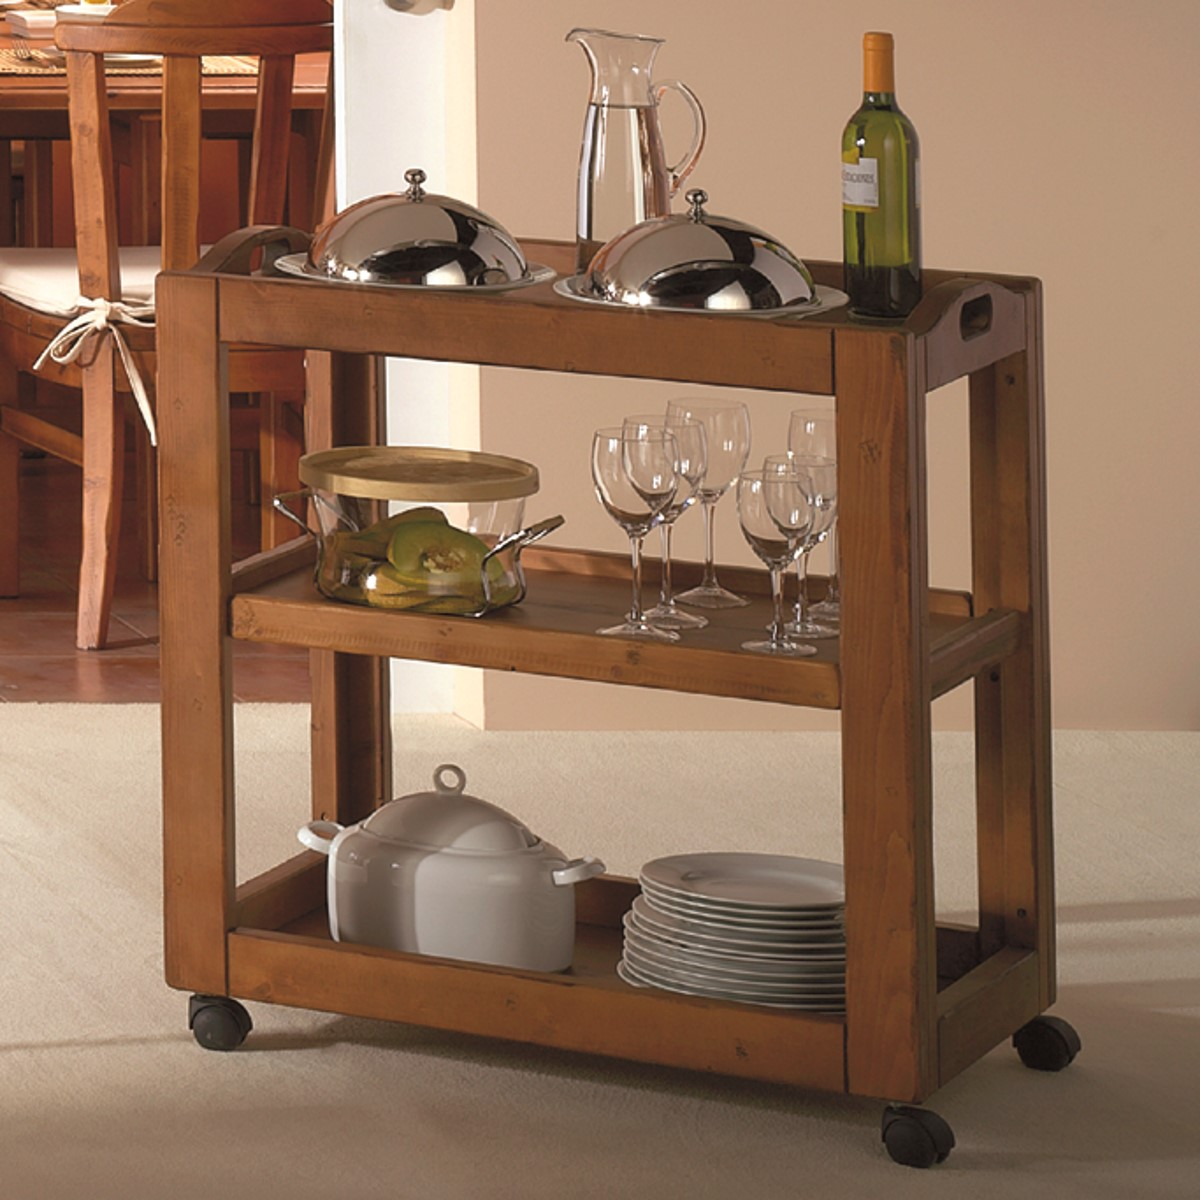 Carrito auxiliar r stico de madera ecor stico venta de muebles - Botelleros de madera rusticos ...